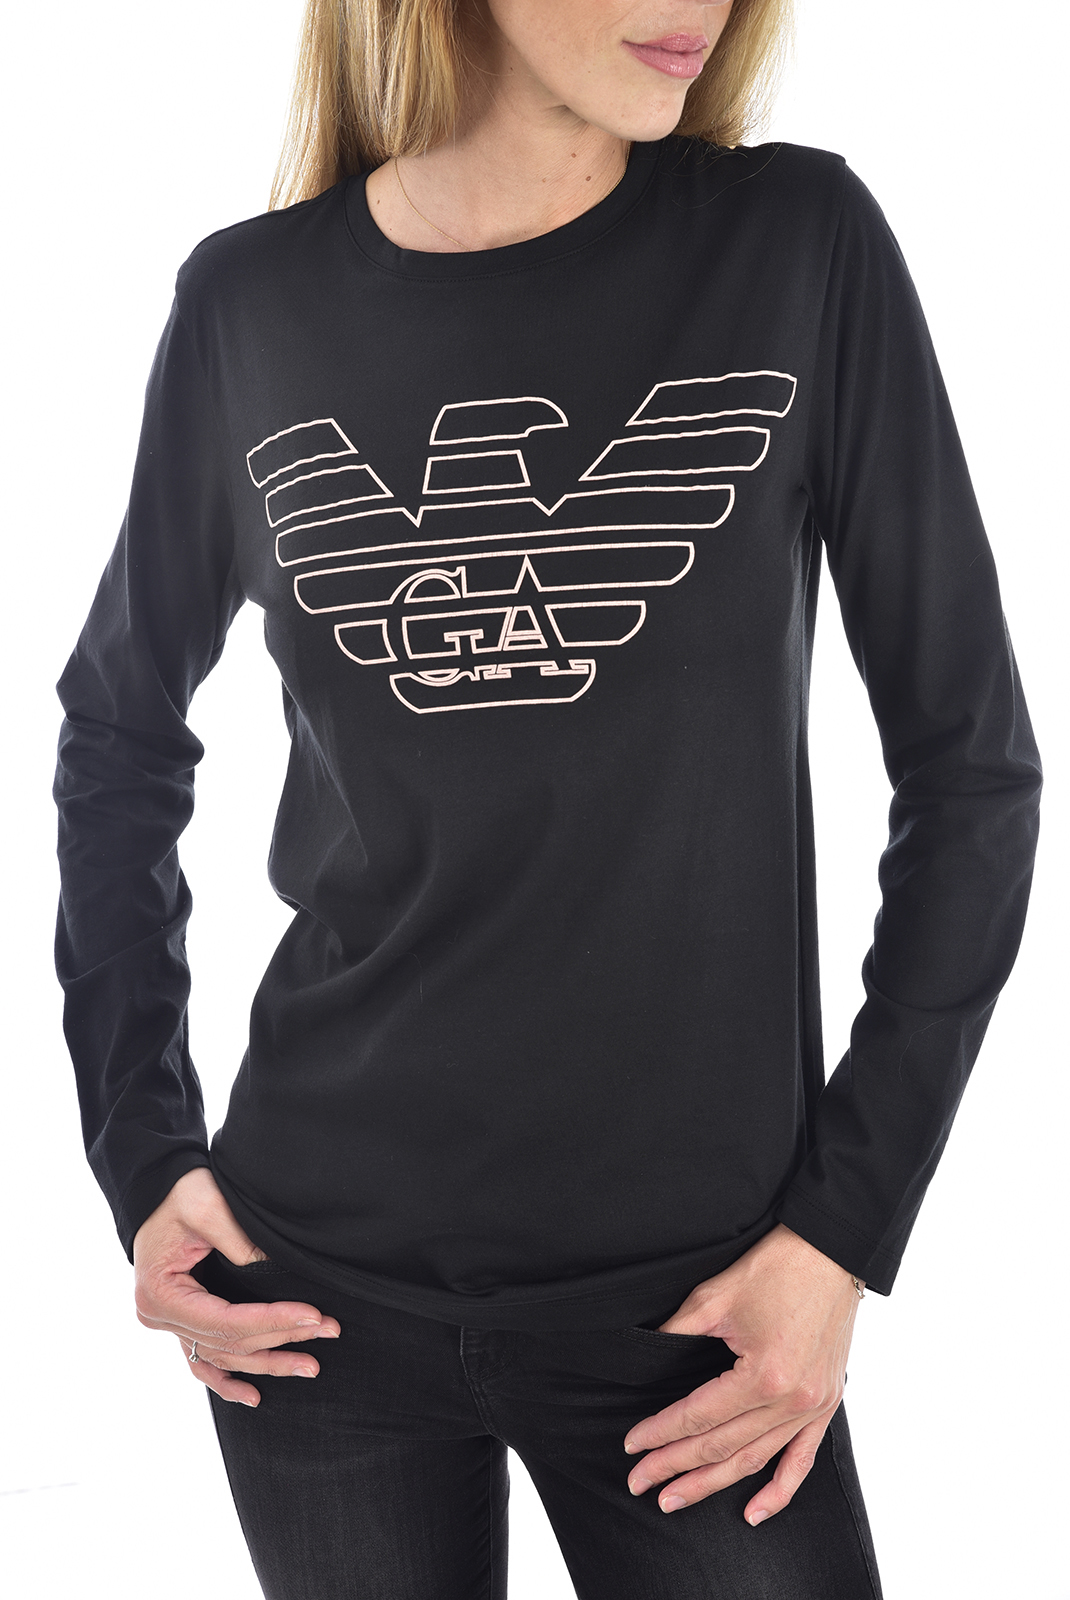 Tee shirt manches longues  Emporio armani 164258 9A255 020 BLACK